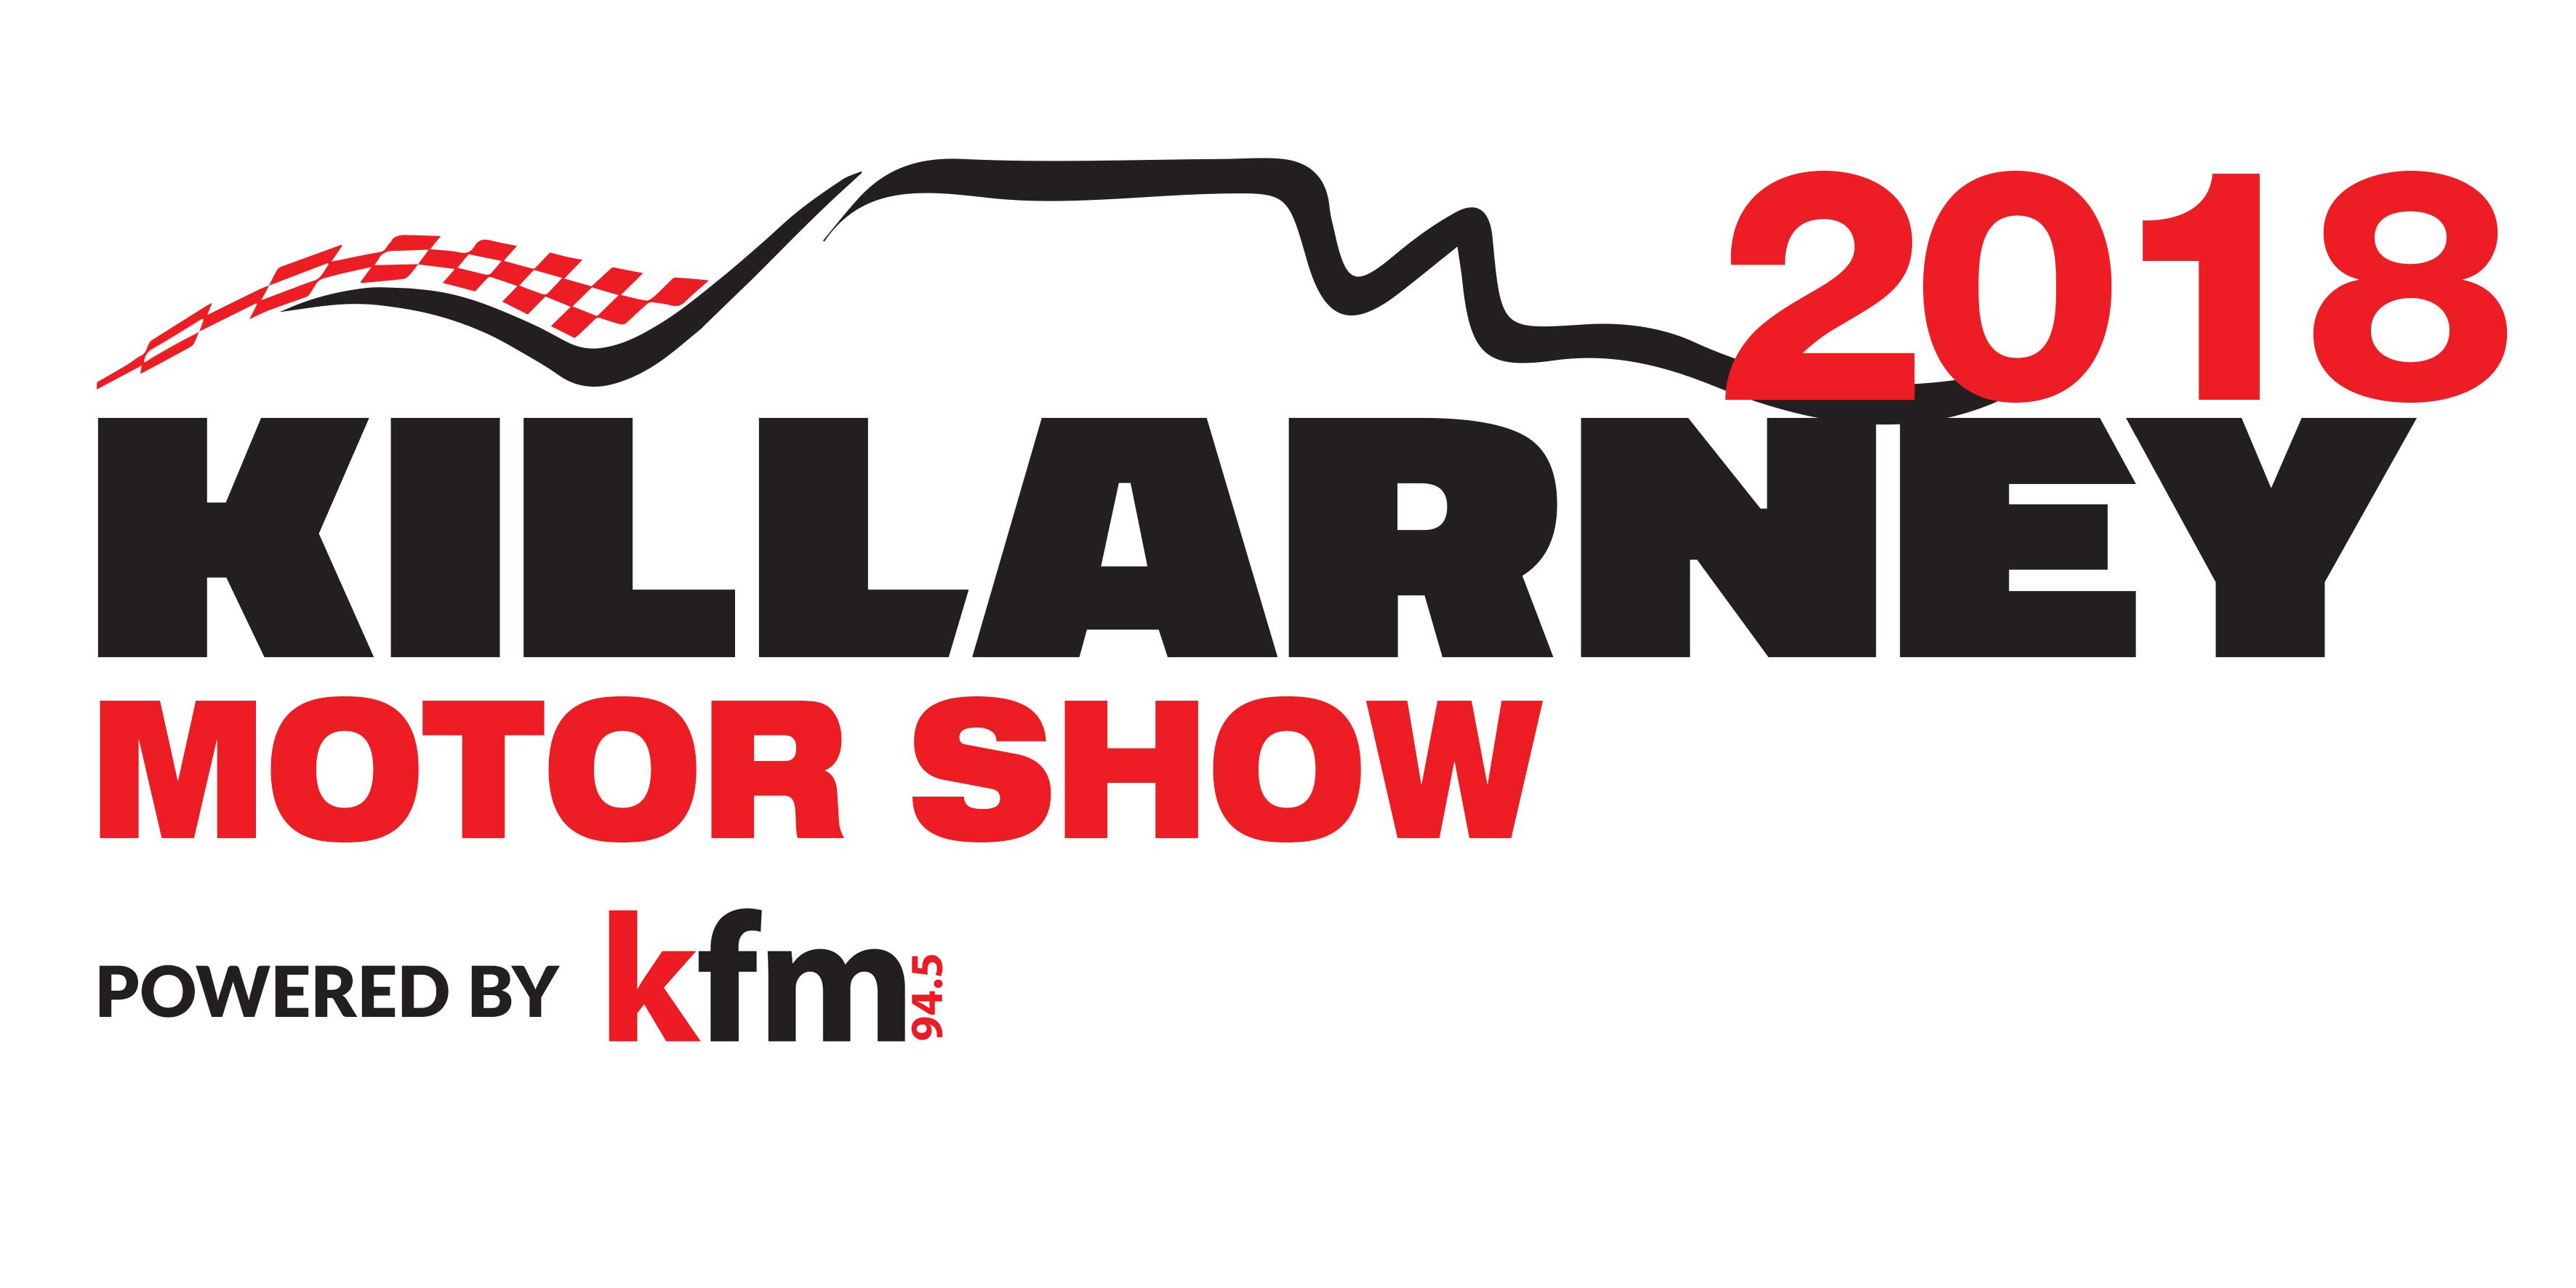 Killarney Motor Show - November 4